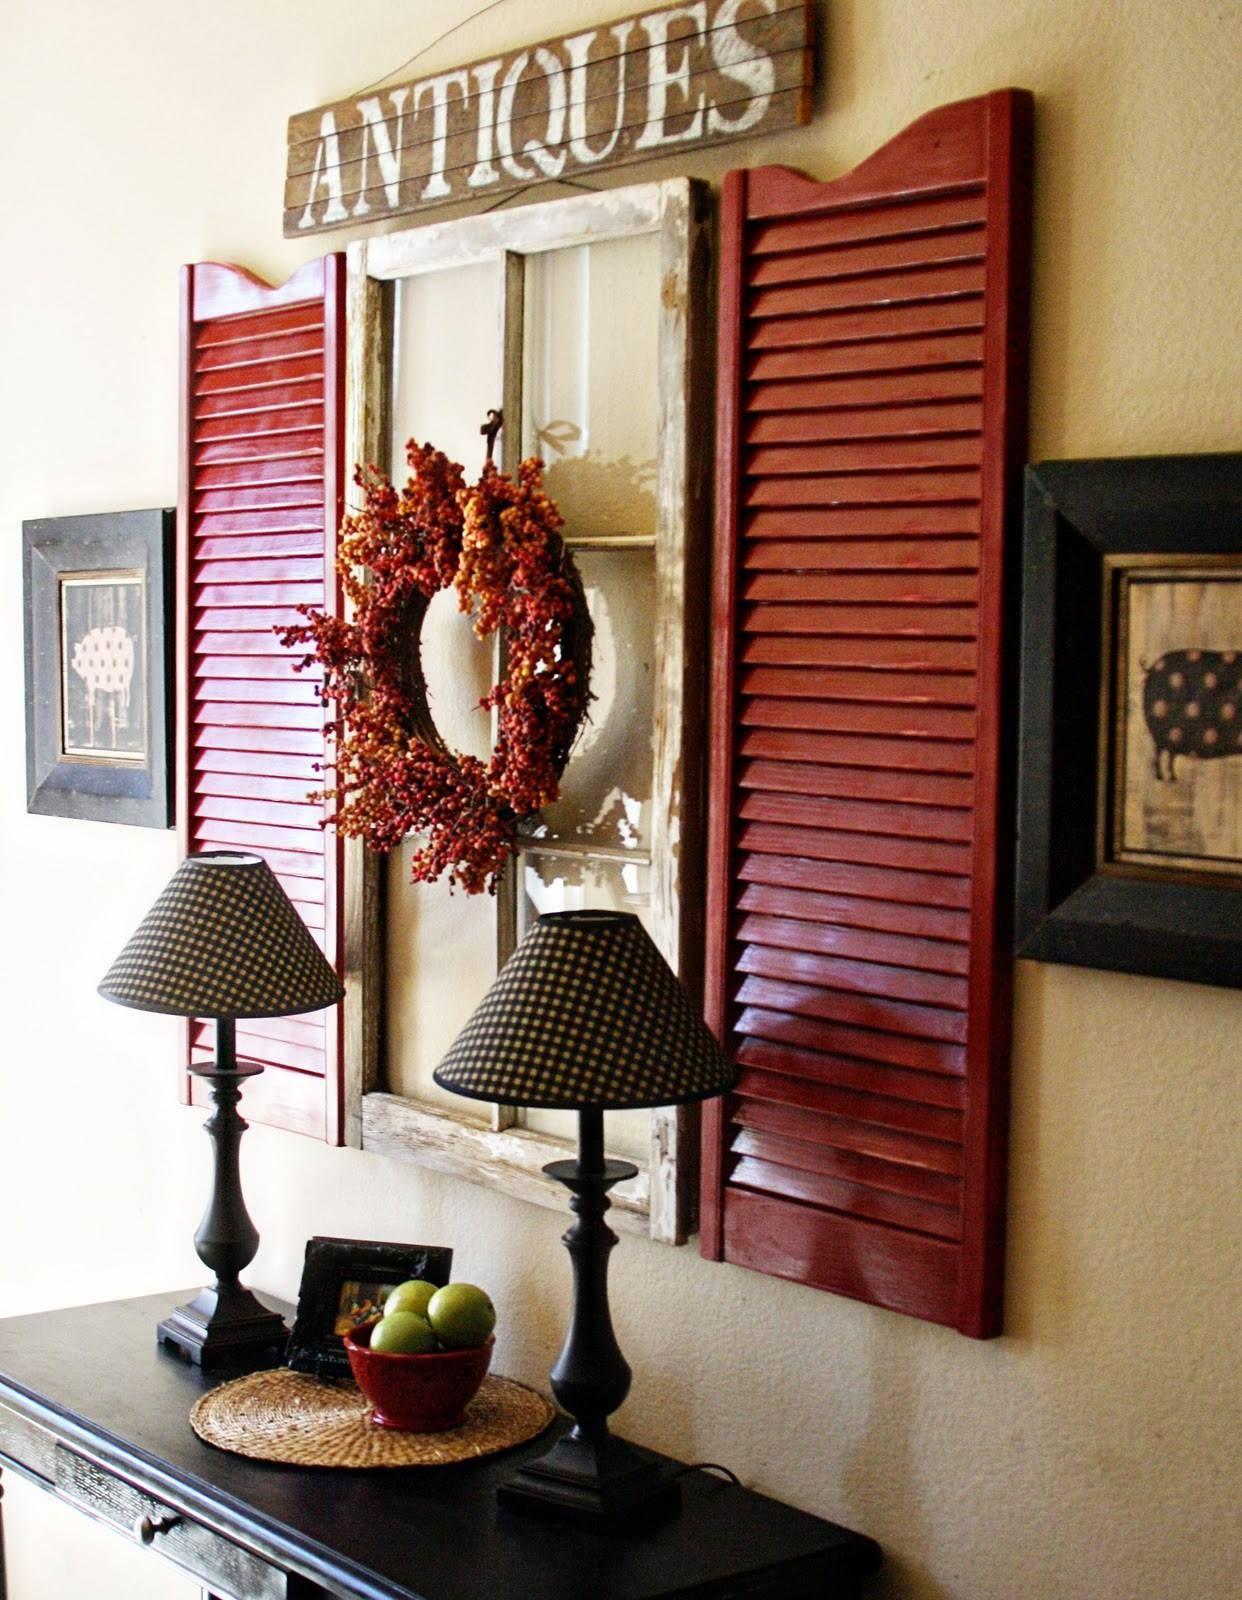 27 Rustic Wall Decor Ideas to Turn Shabby into Fabulous Window